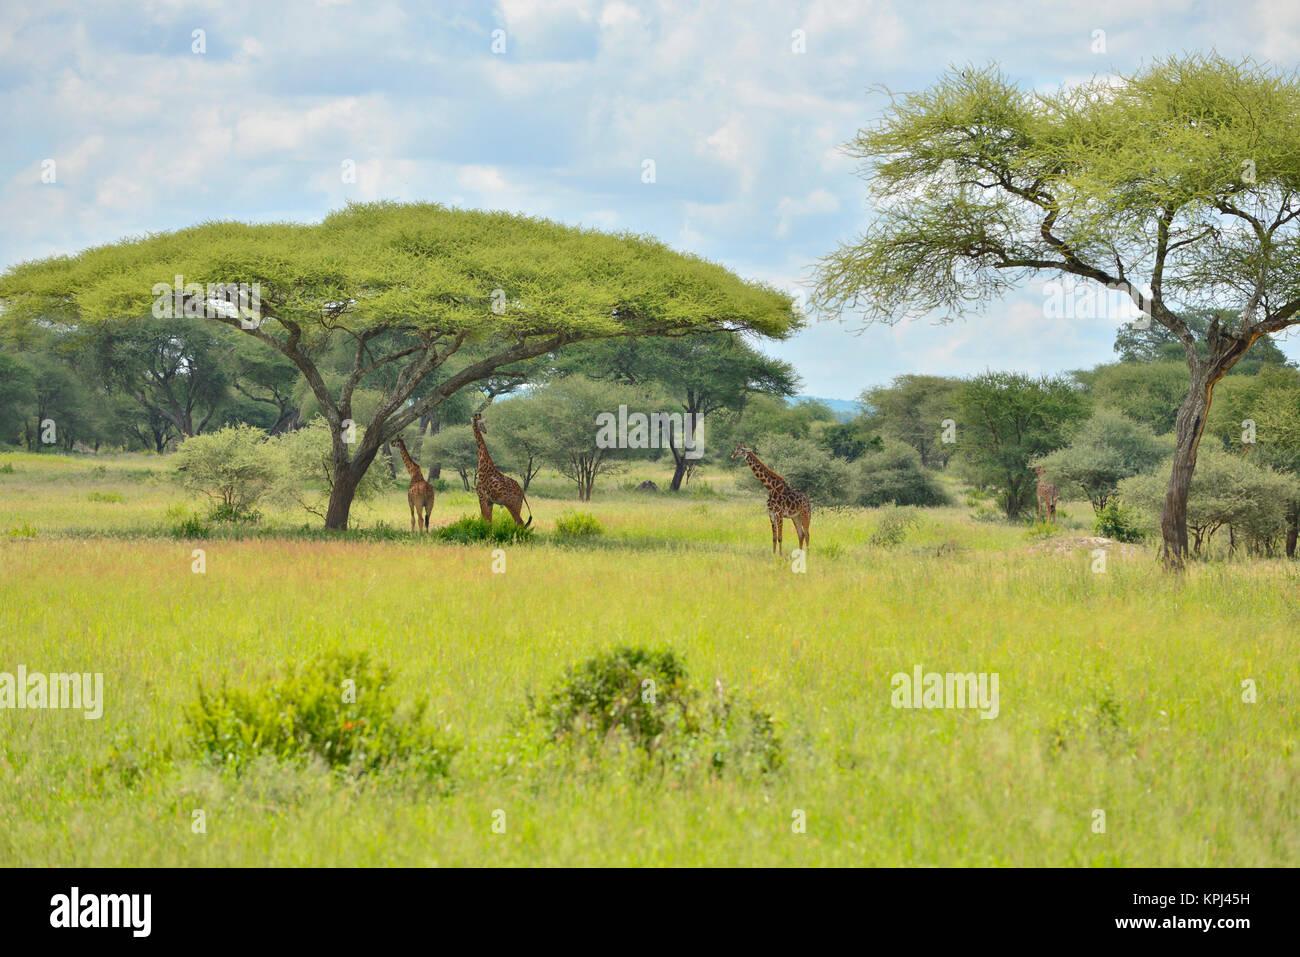 Girafe en vertu de l'acacia dans le parc national de Tarangire, en Tanzanie. Photo Stock